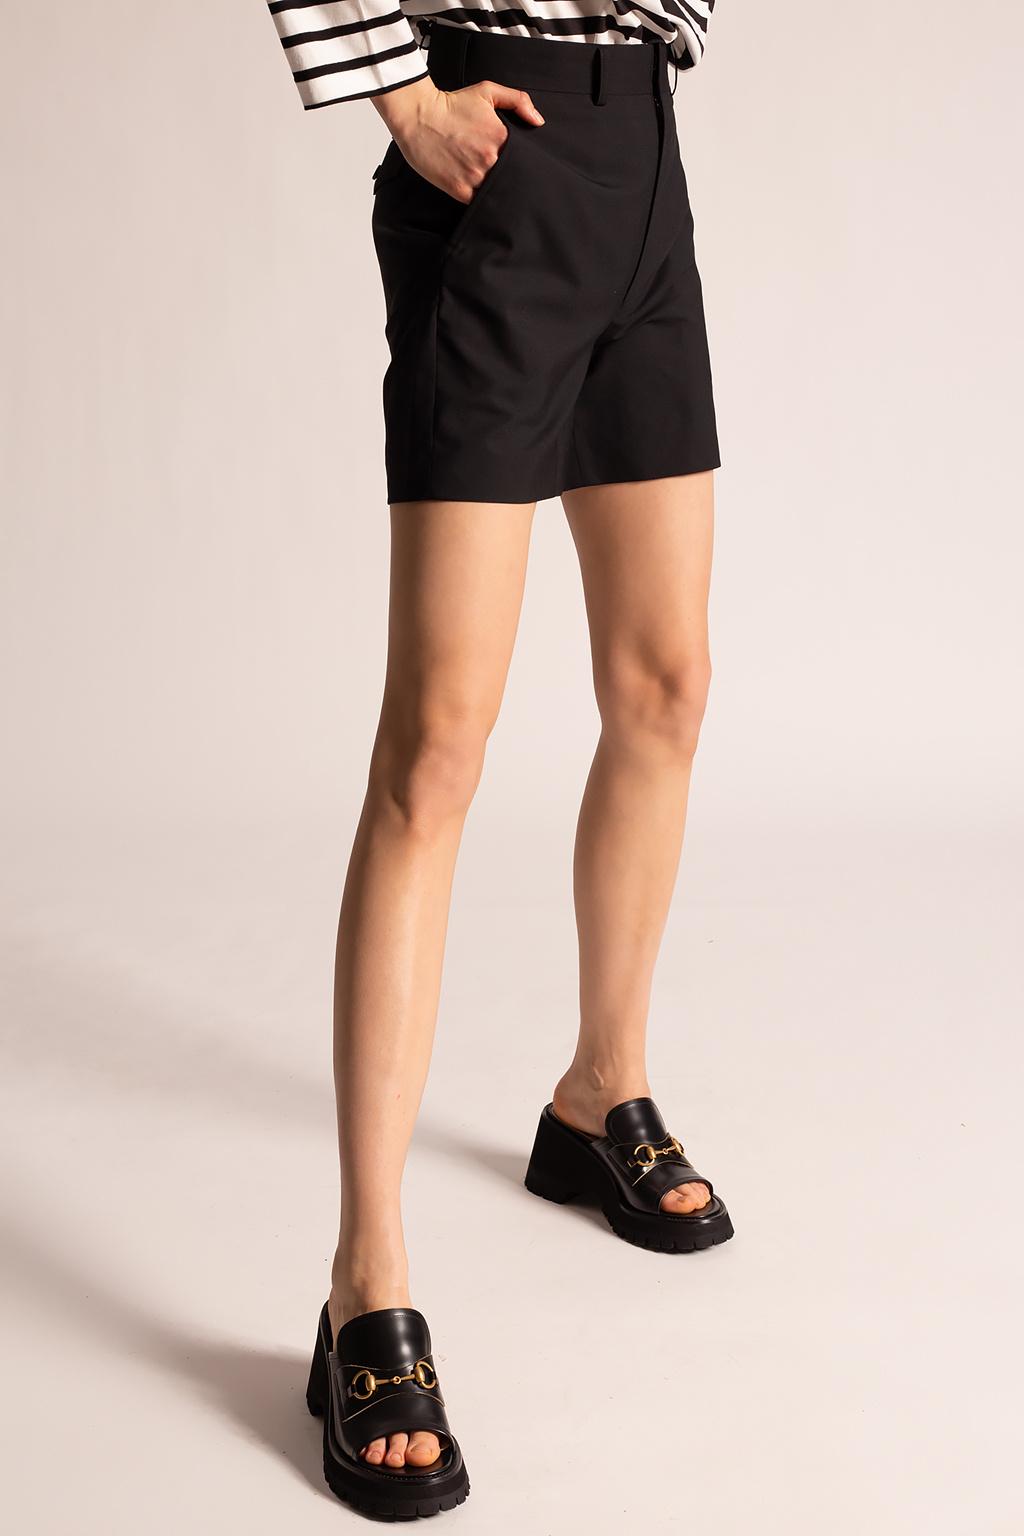 Junya Watanabe Comme des Garcons High-waisted shorts